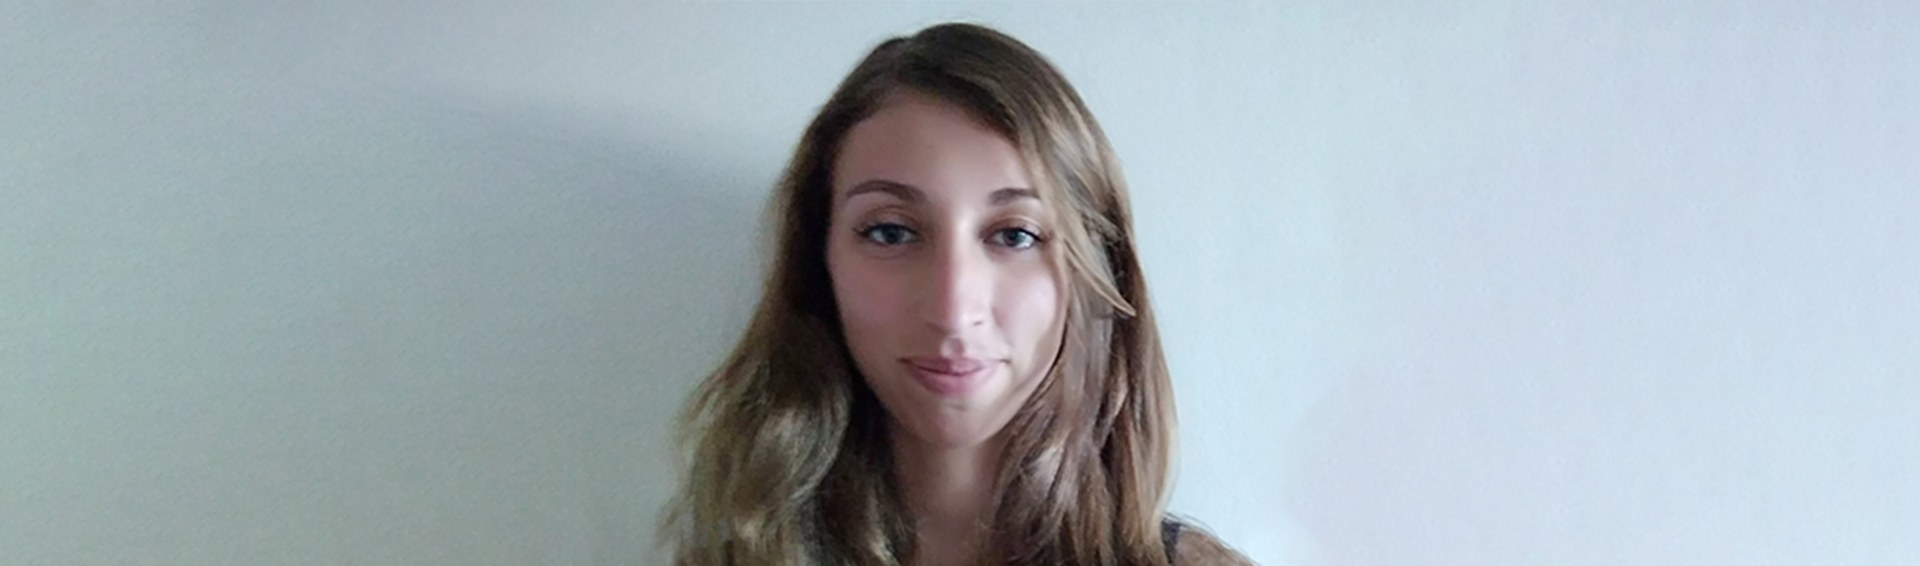 Sarah Sauchelli Toran, NIHR Bristol Biomedical Research Centre (Nutrition)